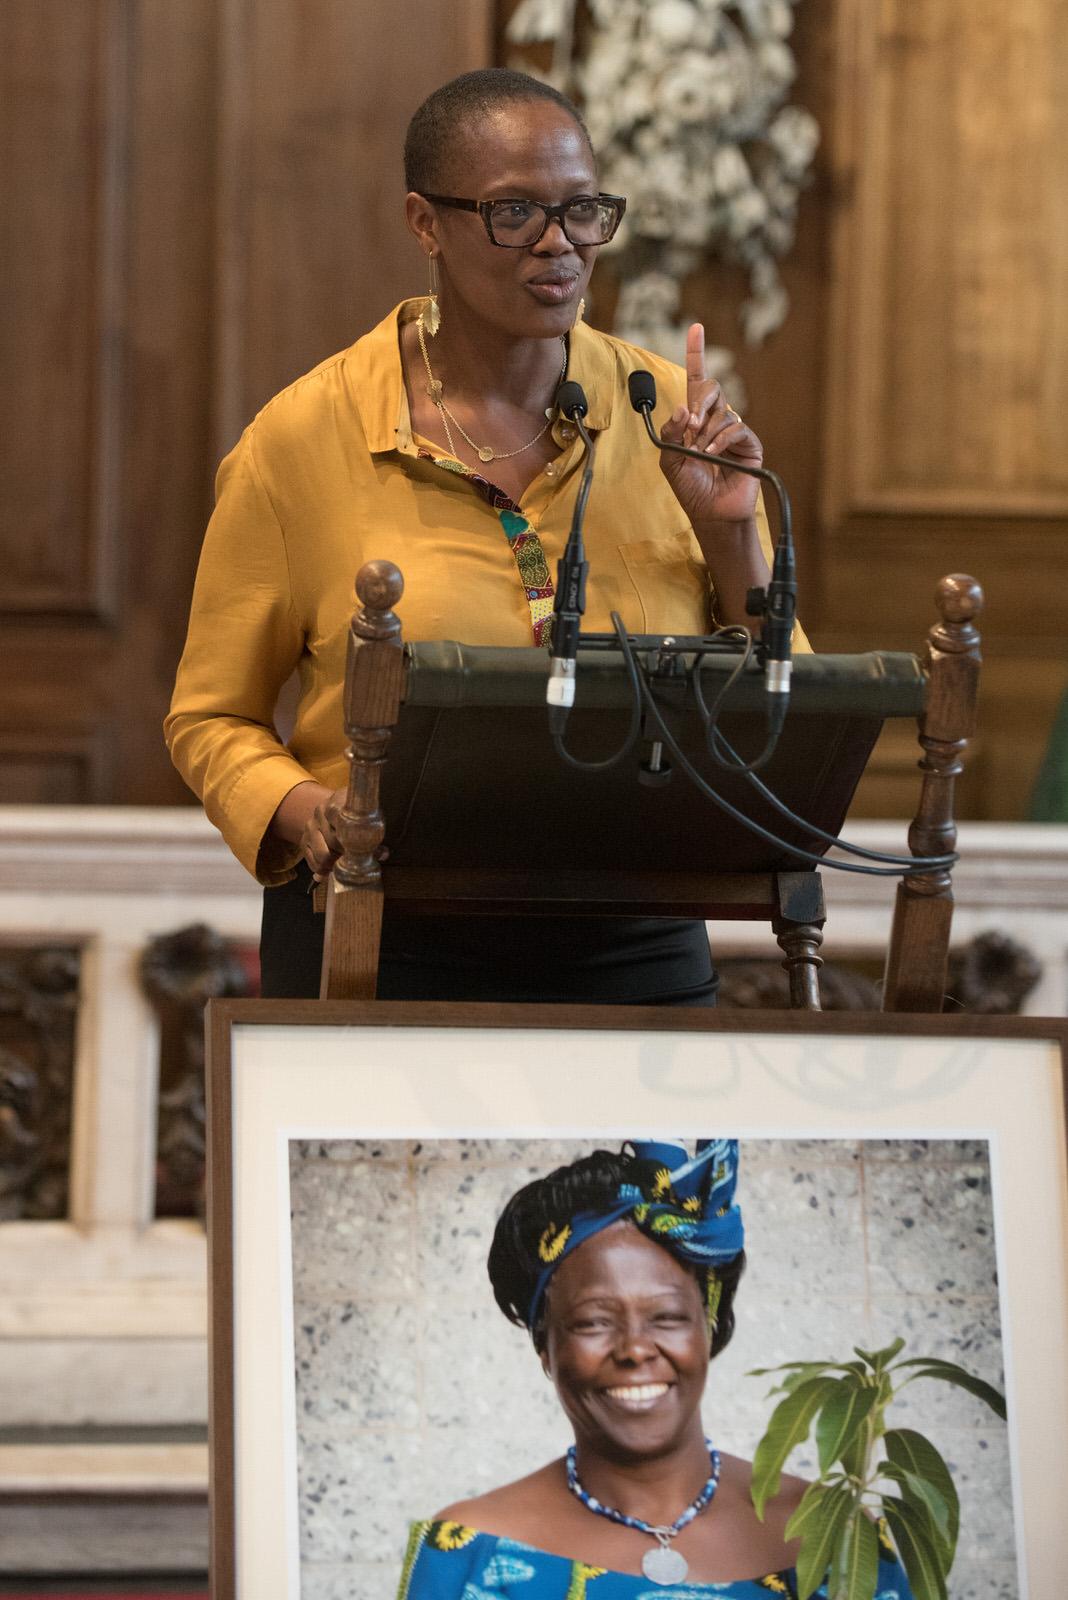 Wanjira Mathai, Chair of the Green Belt Movement makes her remarks